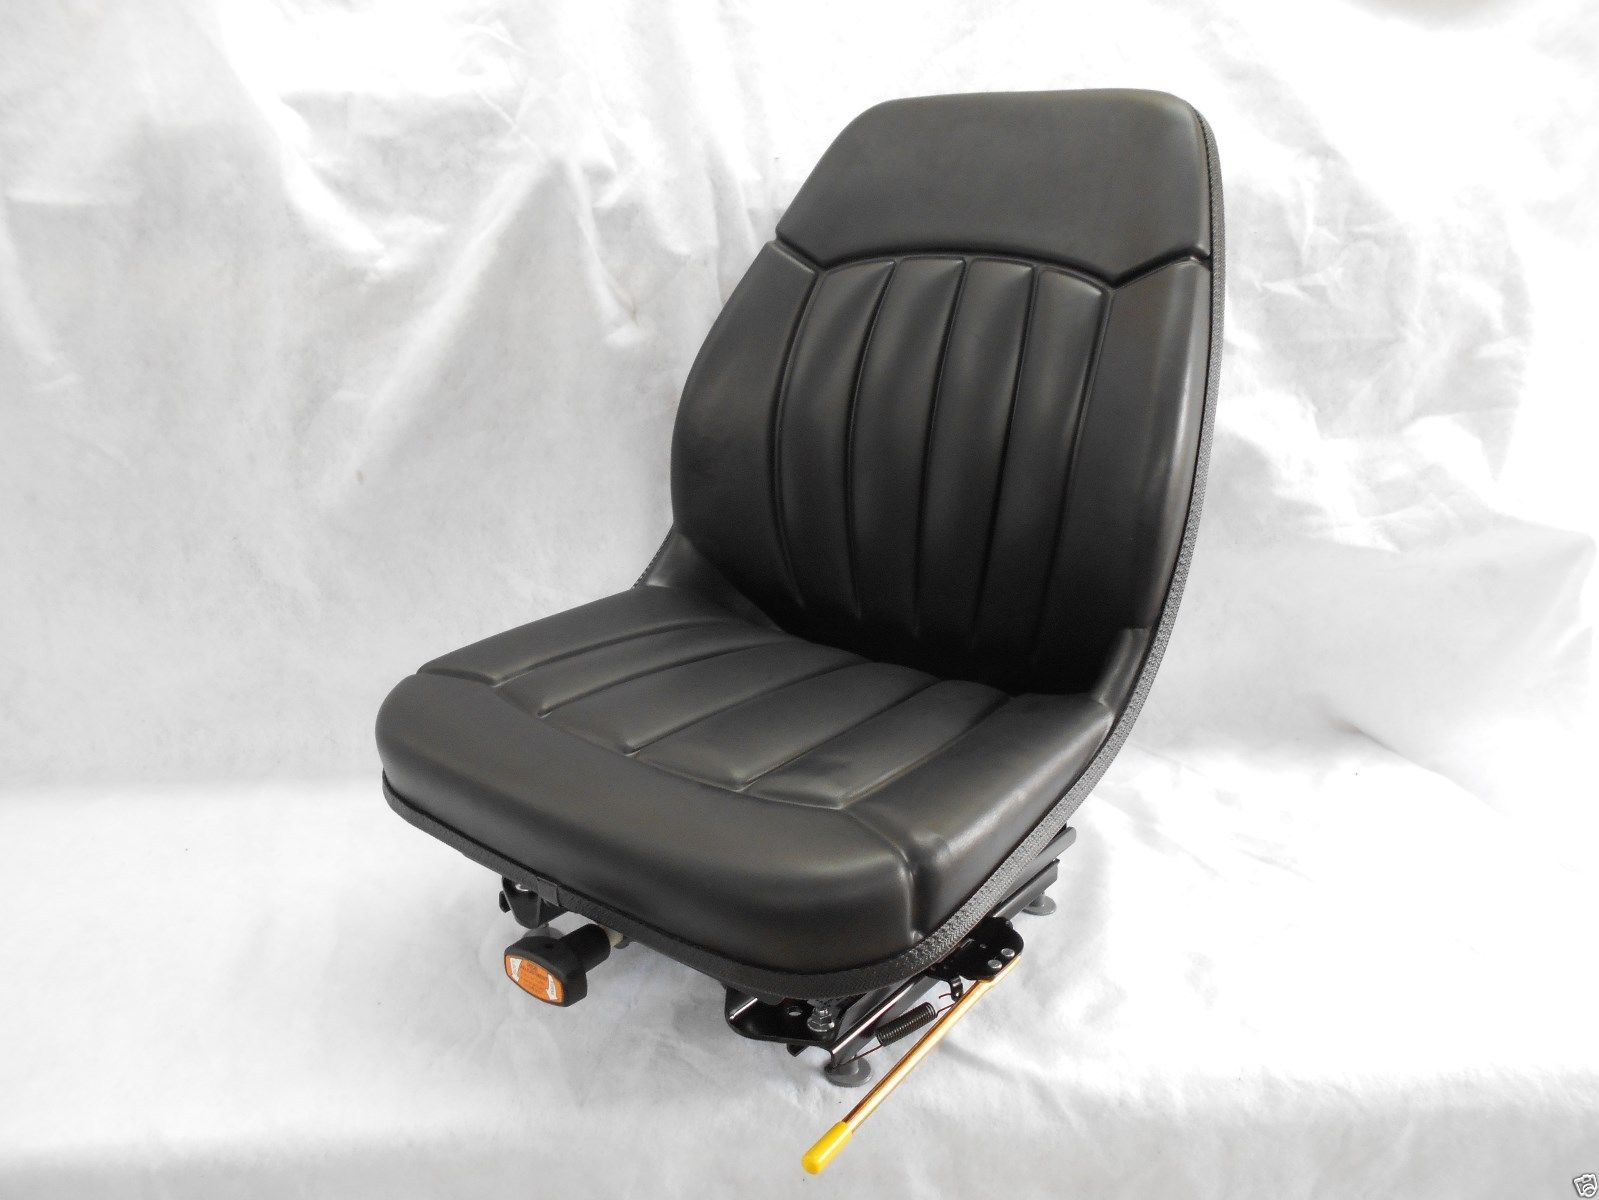 BLACK SUSPENSION SEAT BOBCAT S130, S150, S160, S175, S185, S205, S220, SKID  STEER #OM